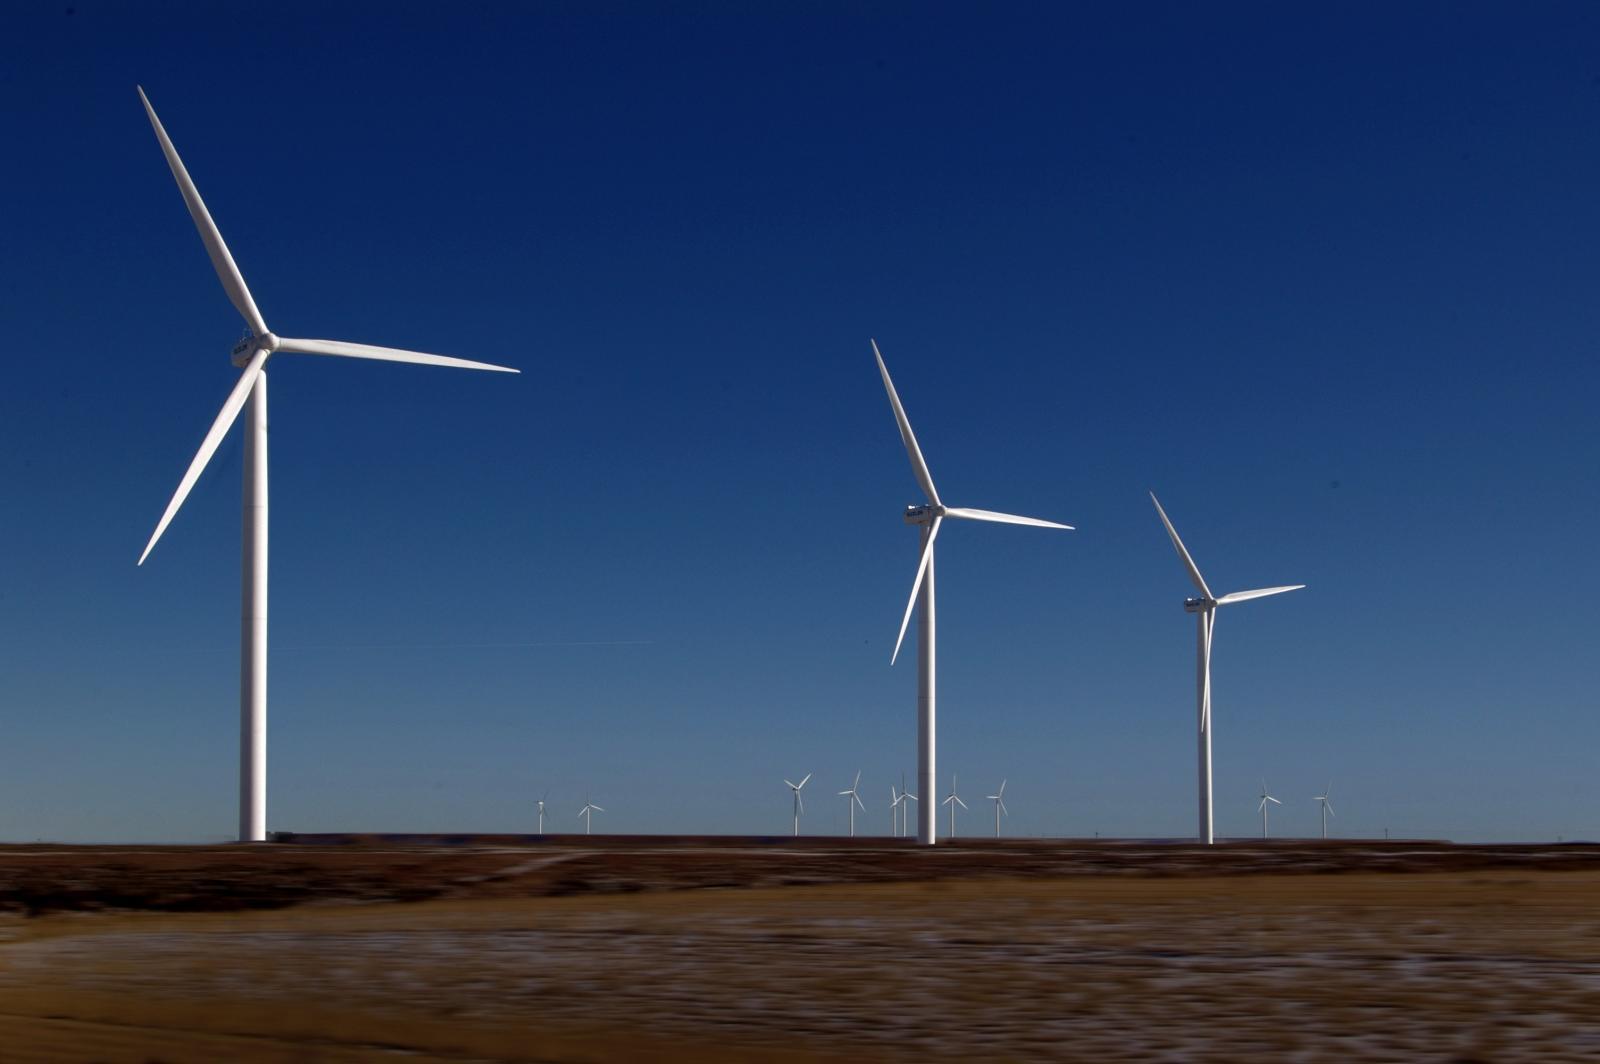 Wind turbines. Photo credit: Pexels